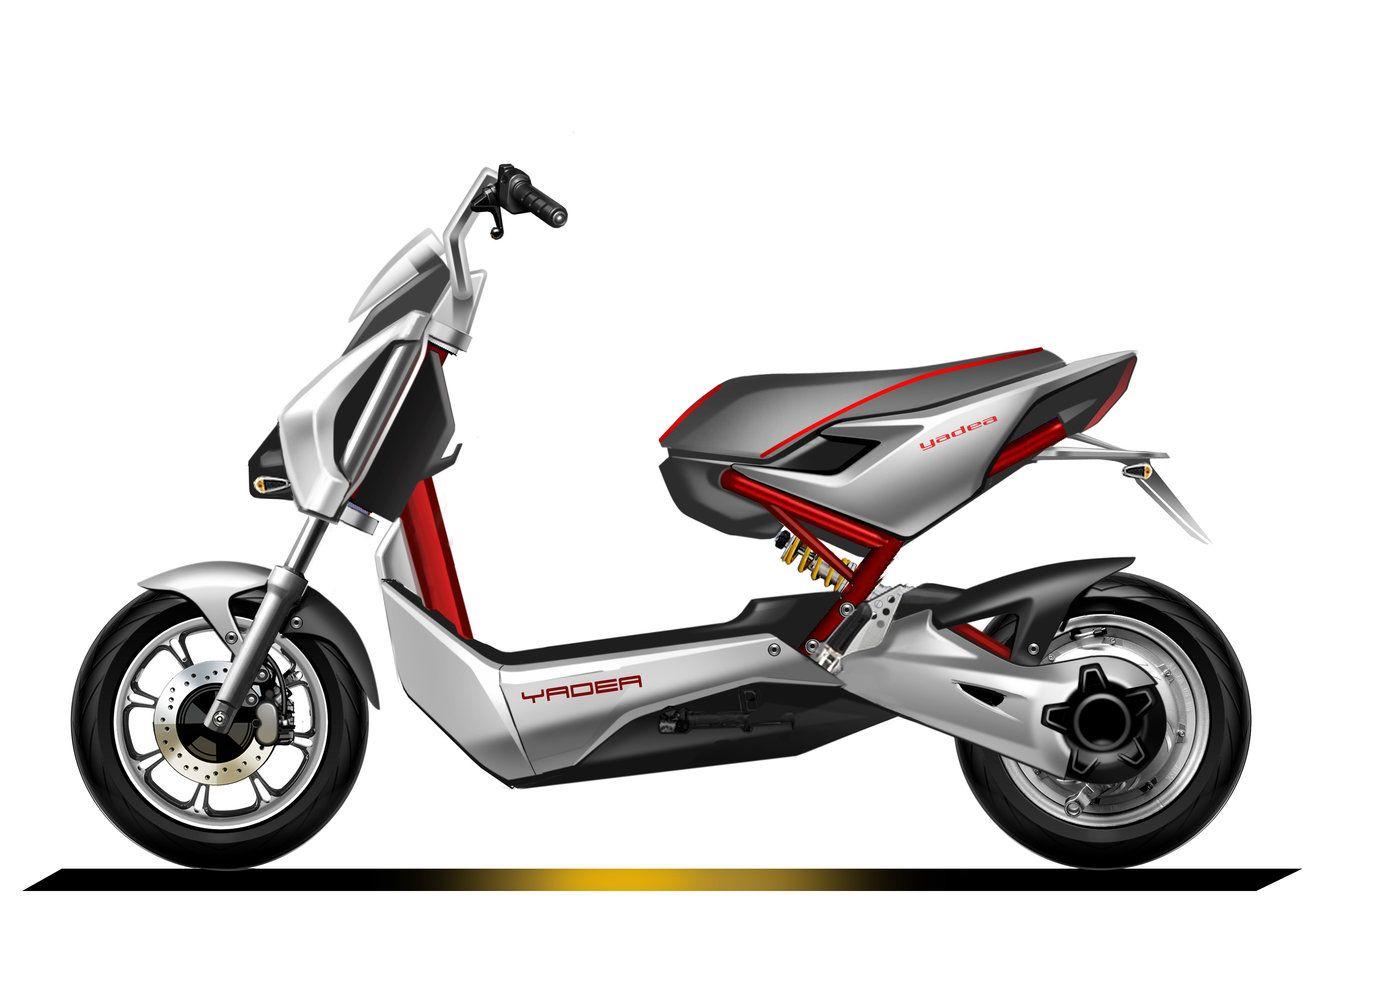 Yadea Electric Scooter By Lukes Lu At Coroflot Com Bike Sketch Motorbike Design Scooter Bike